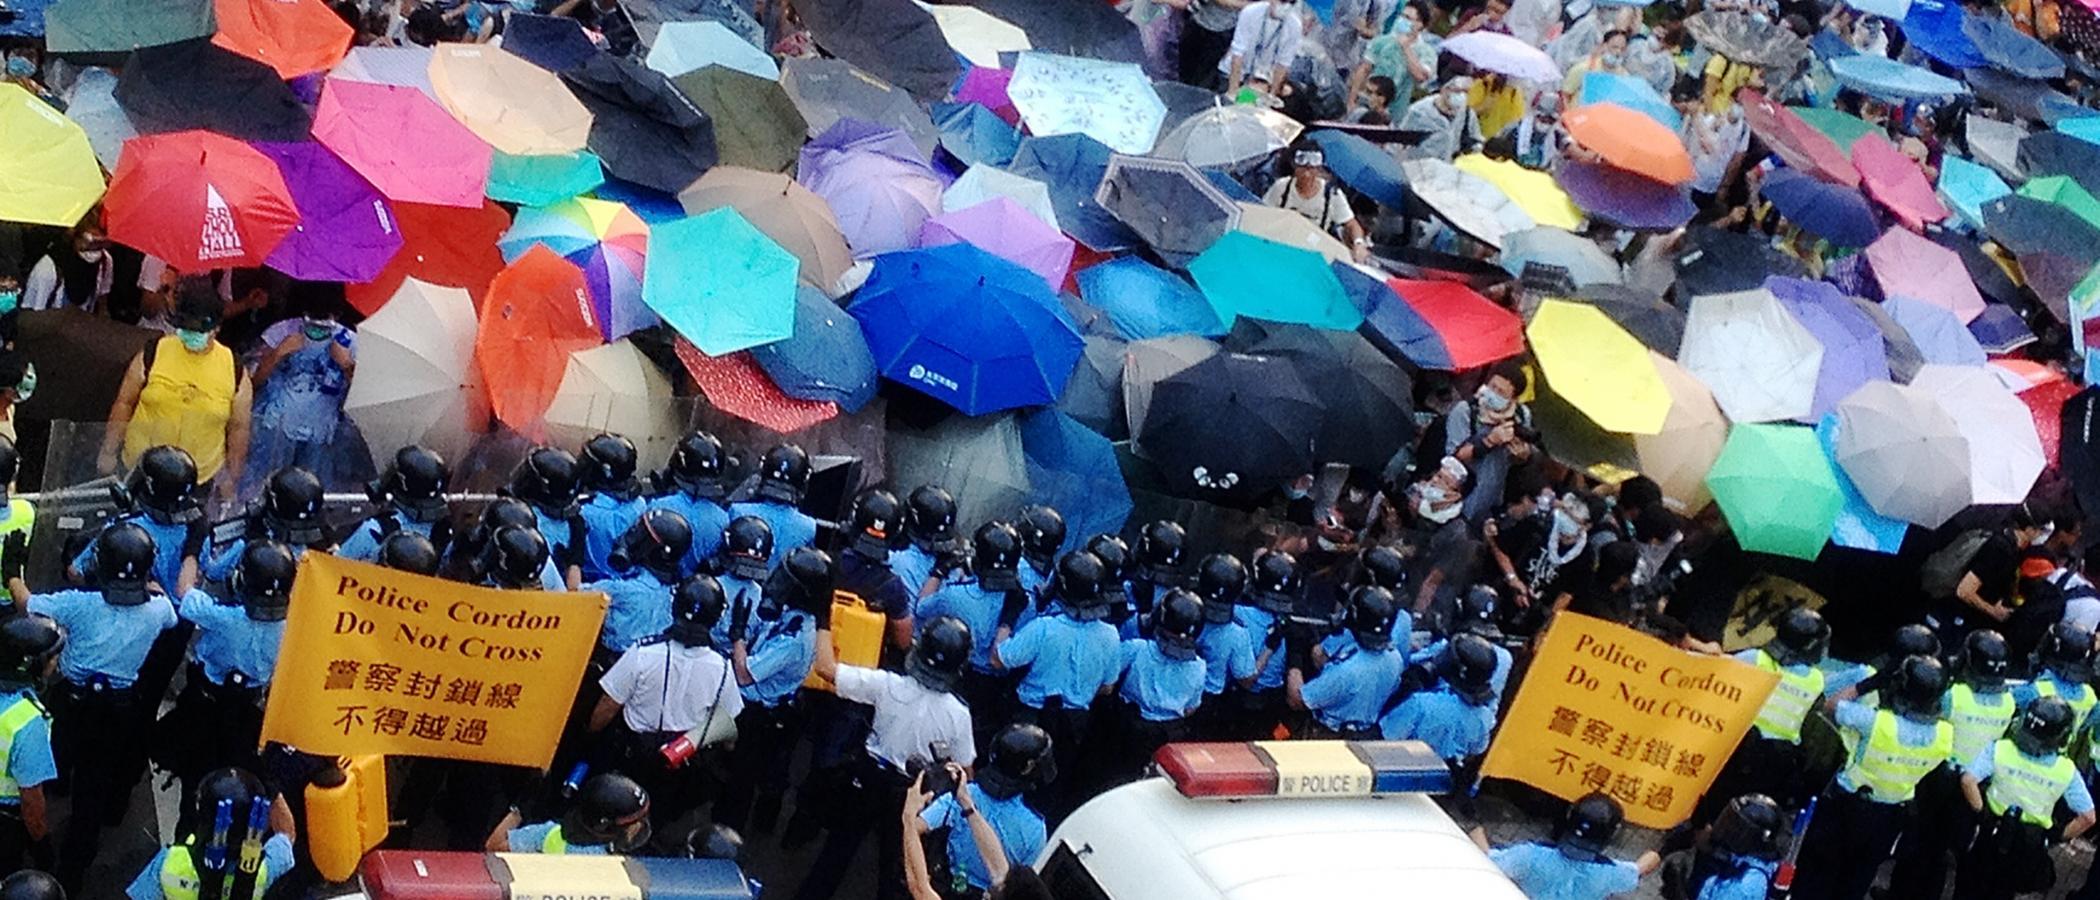 OccupyCentral4464b Confrontation.jpg